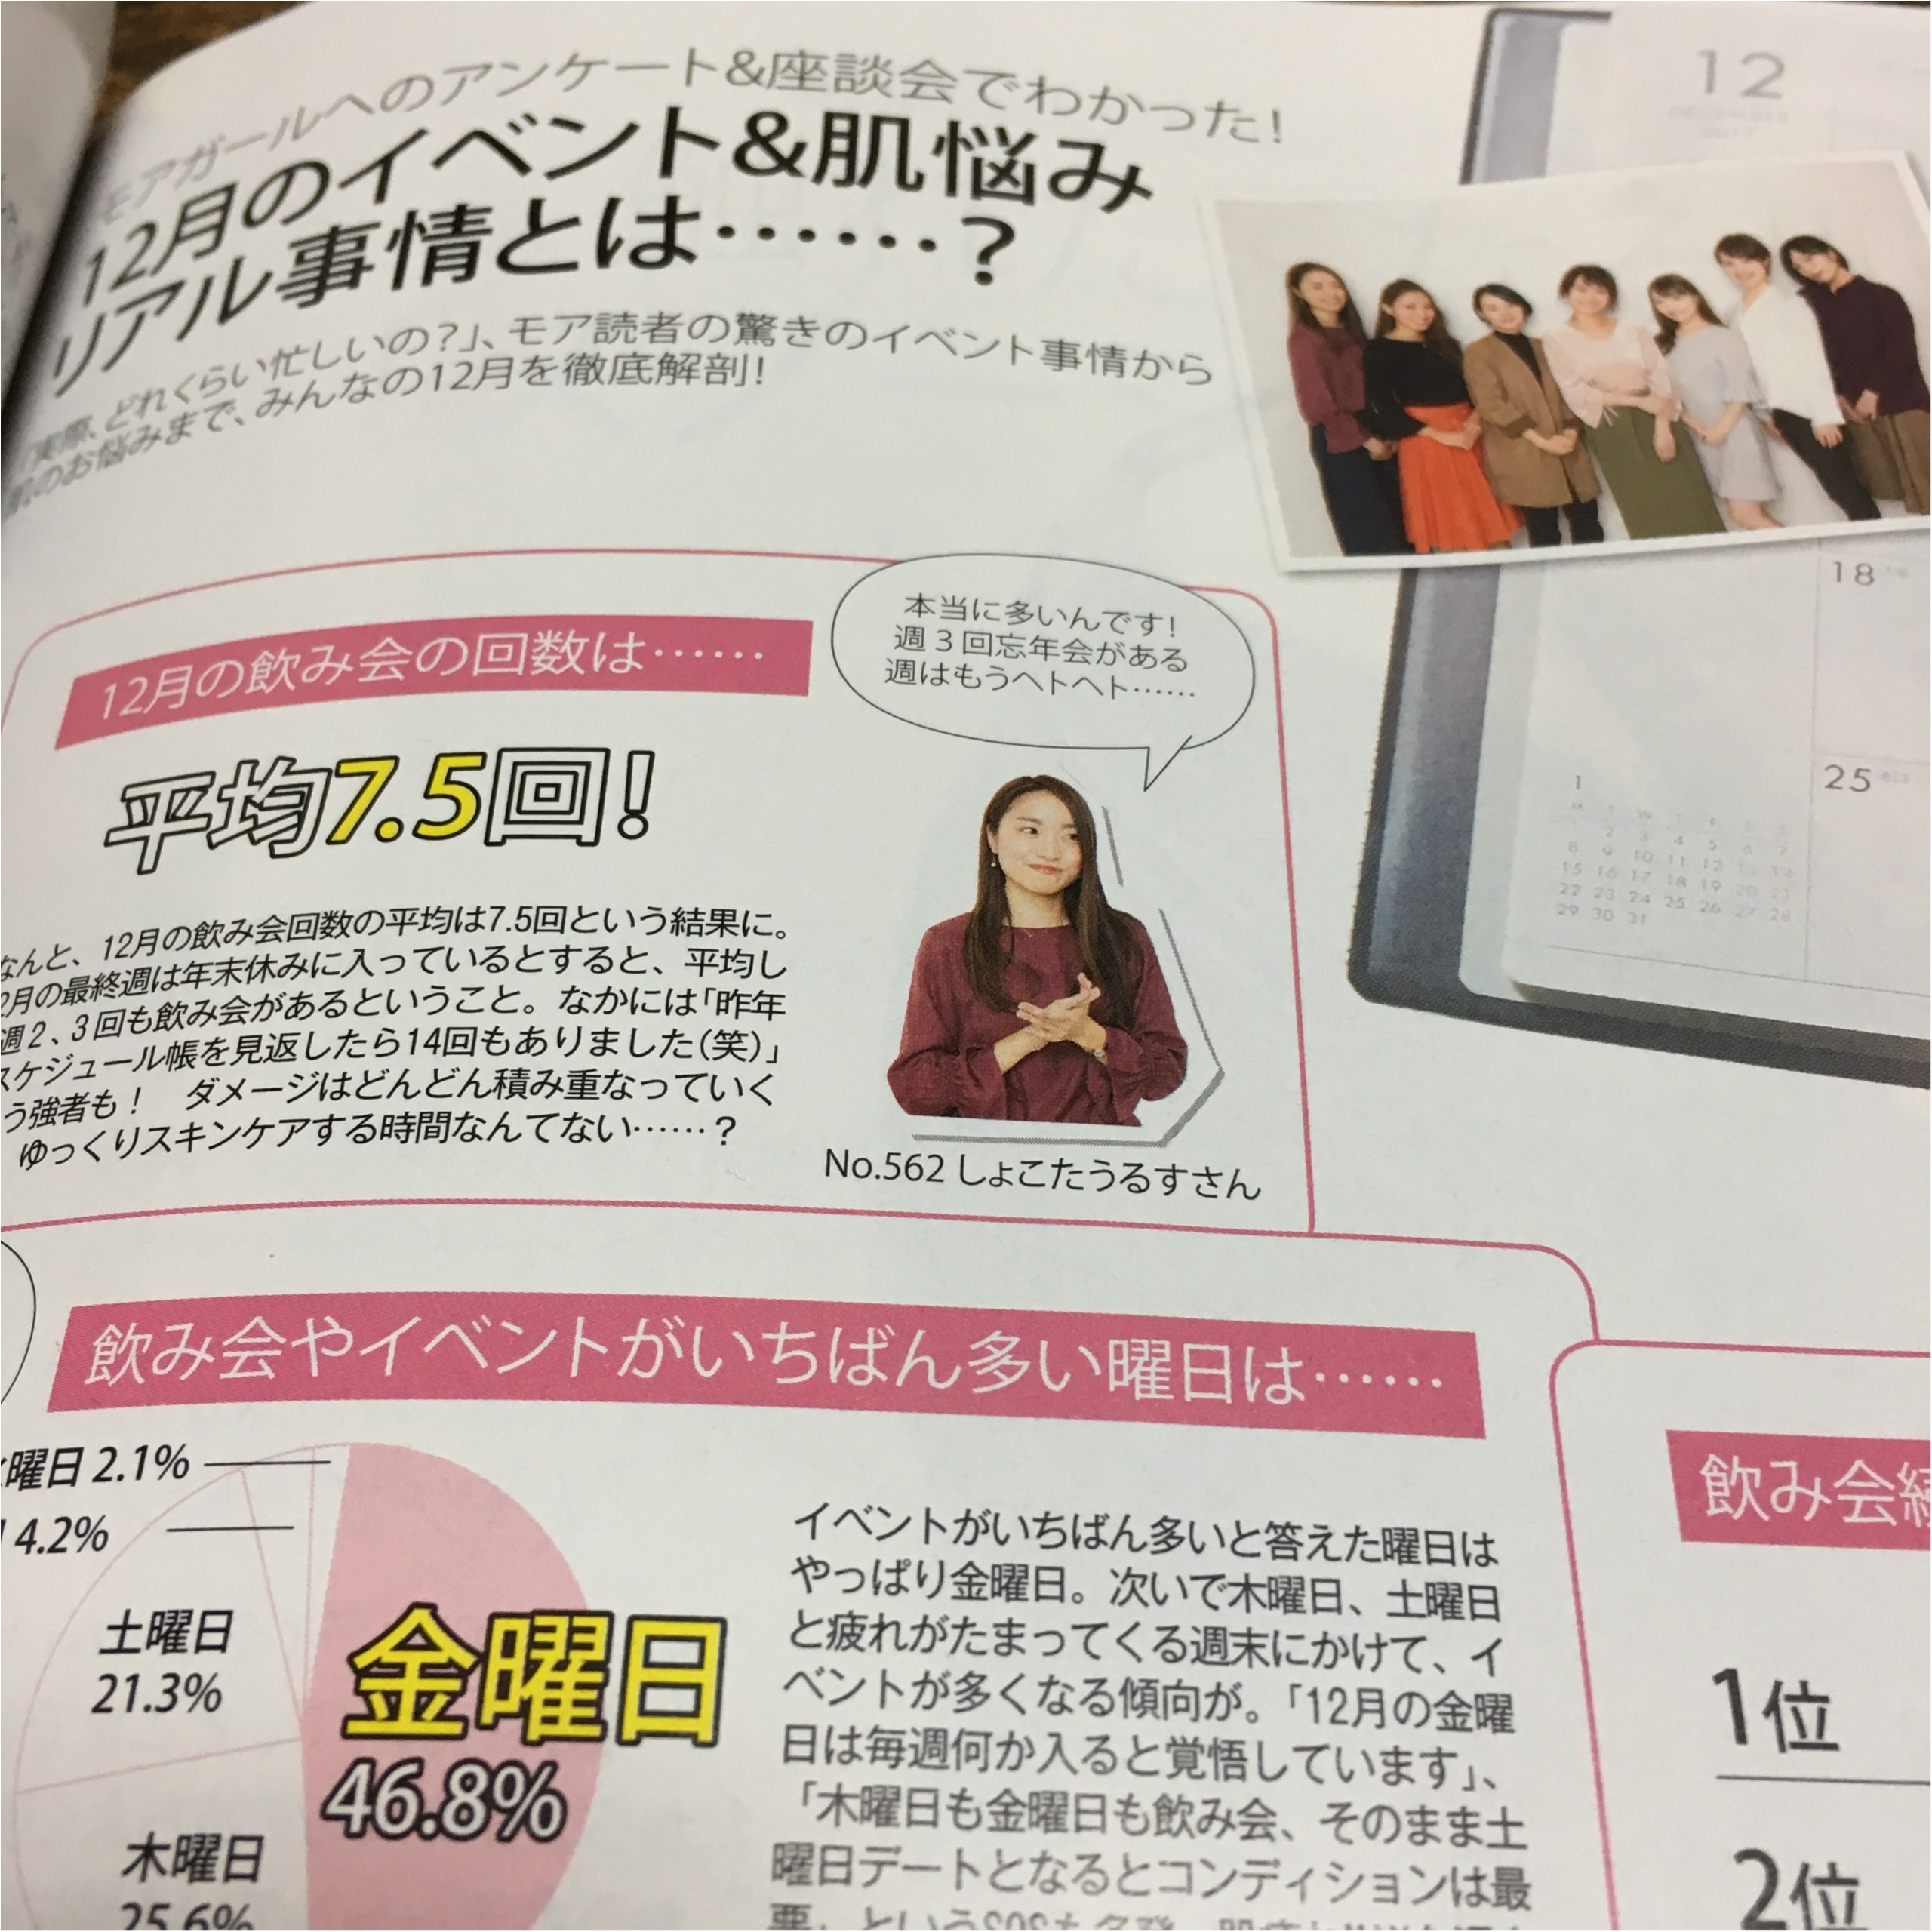 《MORE1月号掲載中★》大好きな高野麻子さん直伝❤️【太らないコーデ】をチェック!!_6